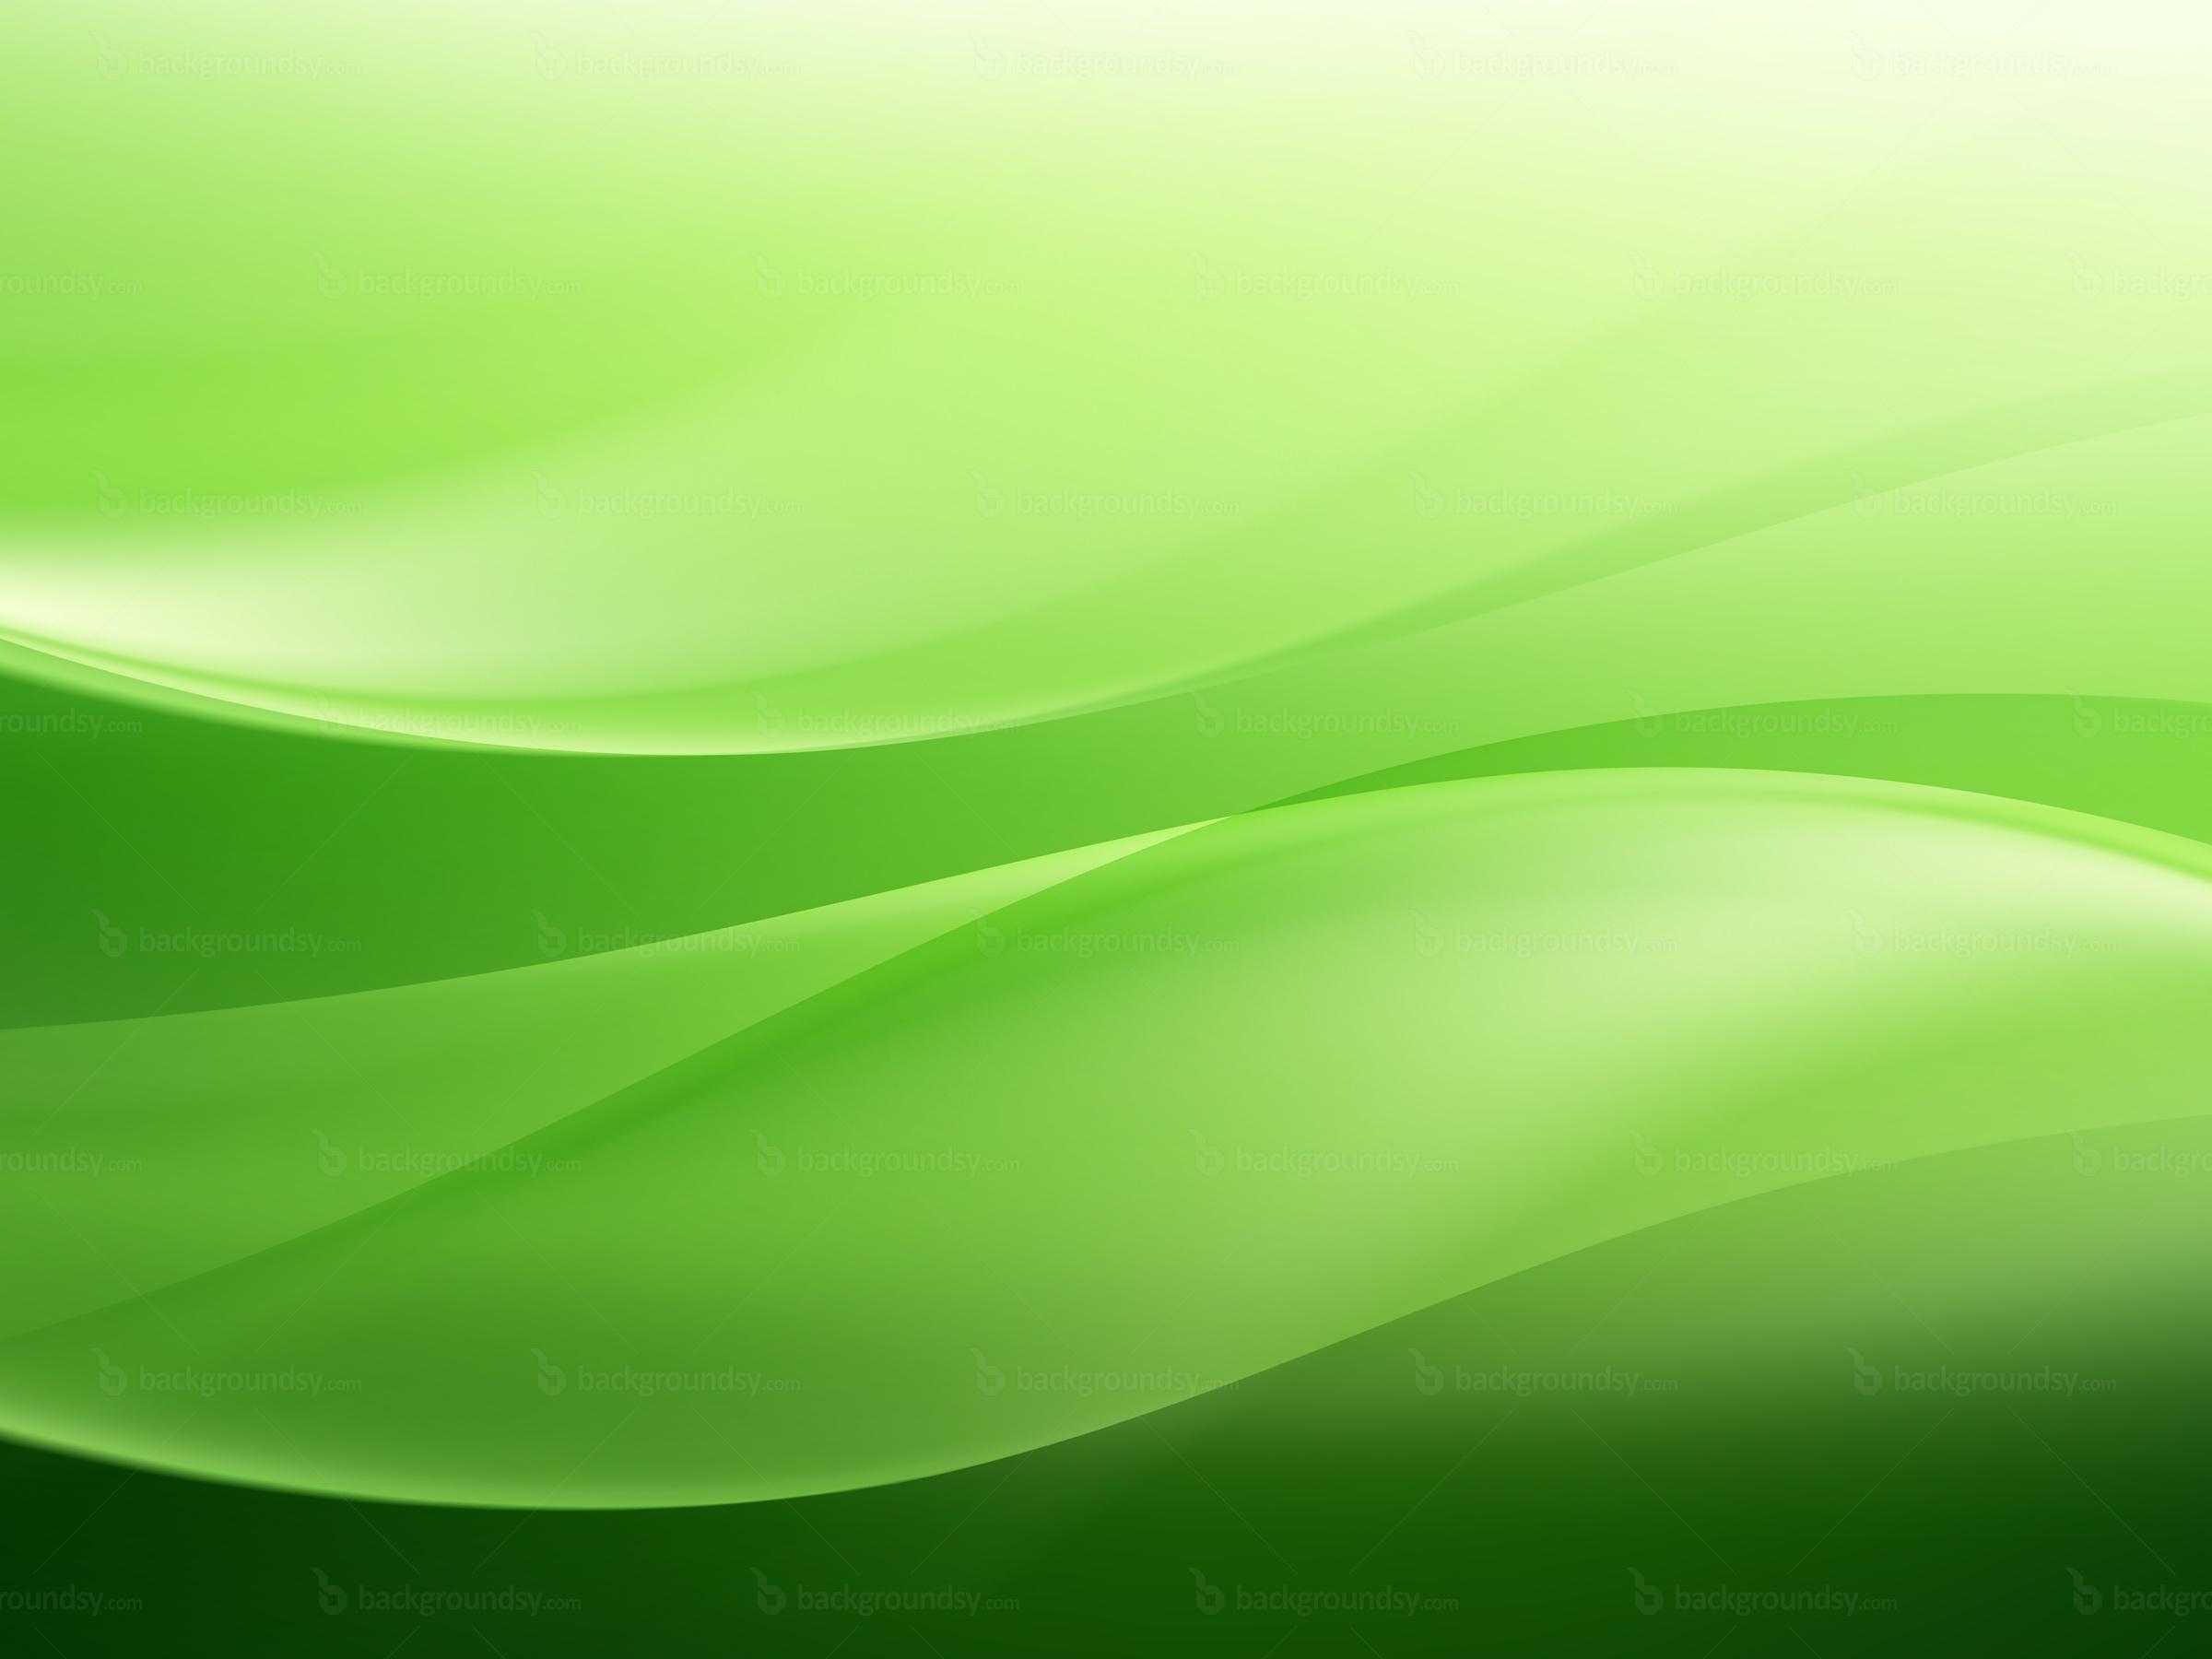 Green waves background Backgroundsycom 2400x1800